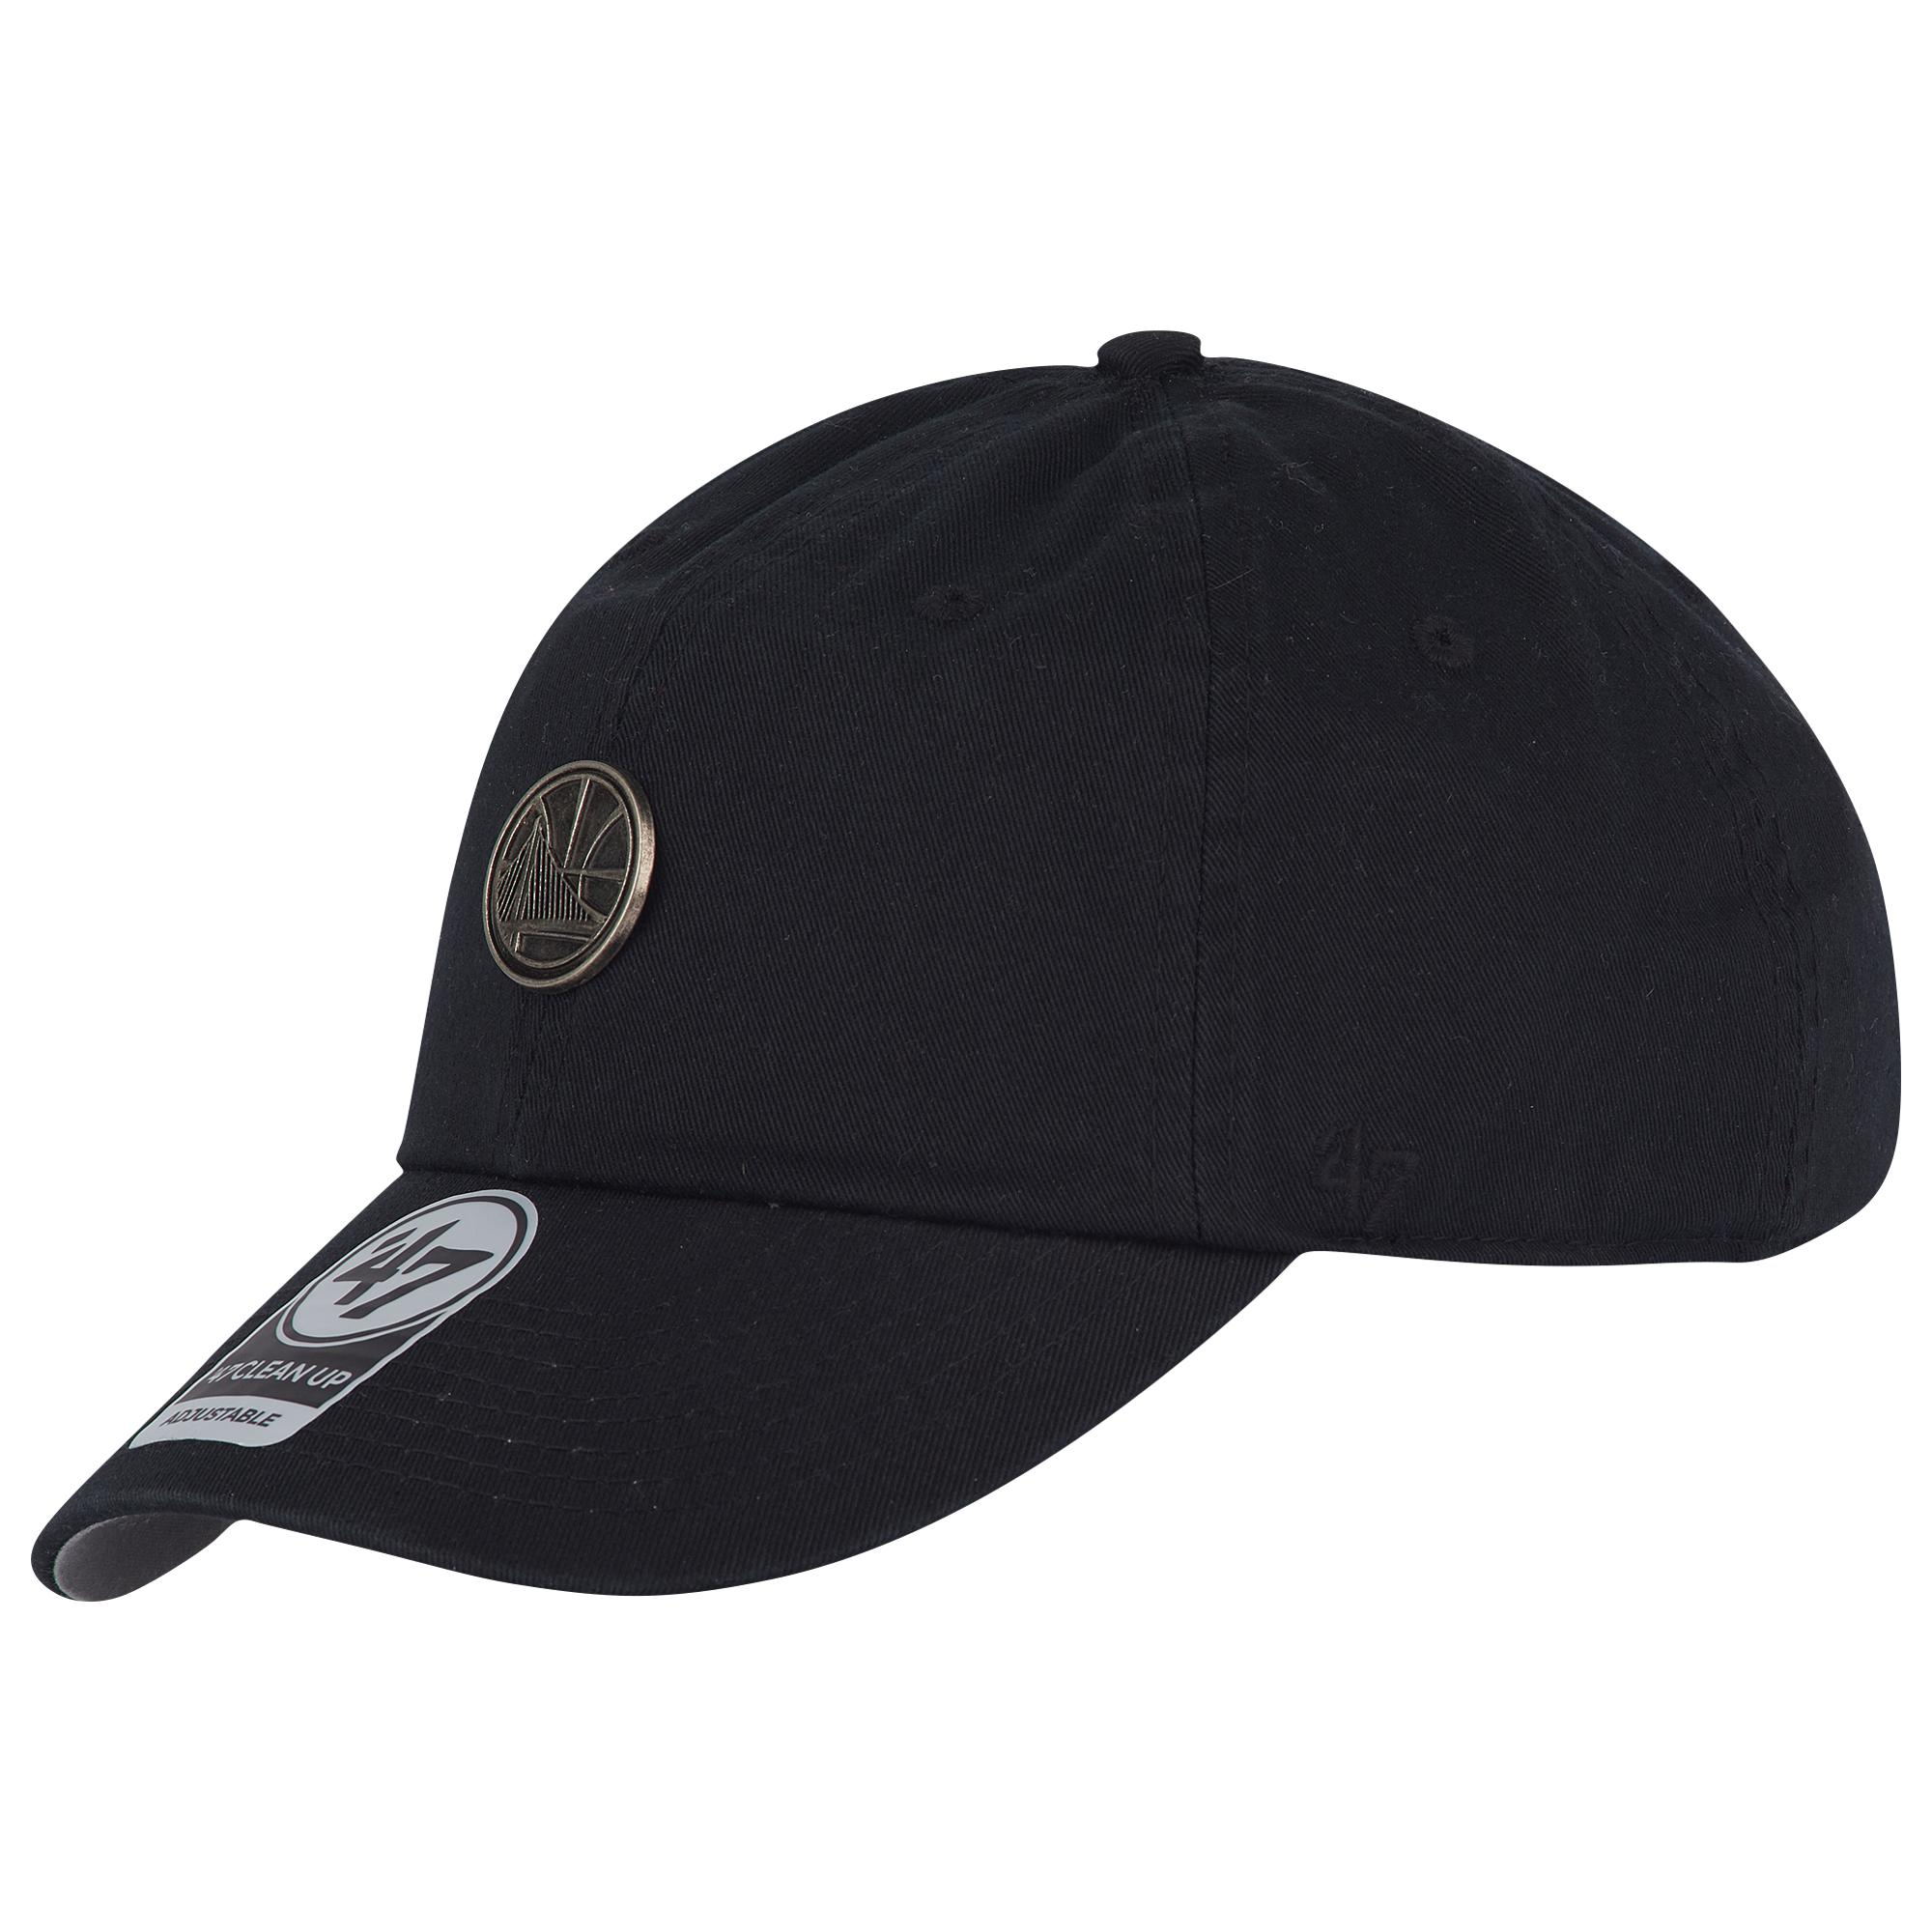 587f3b33823e1a 47 Brand. Men's Blue Golden State Warriors Nba Badge Cleanup Adjustable Cap